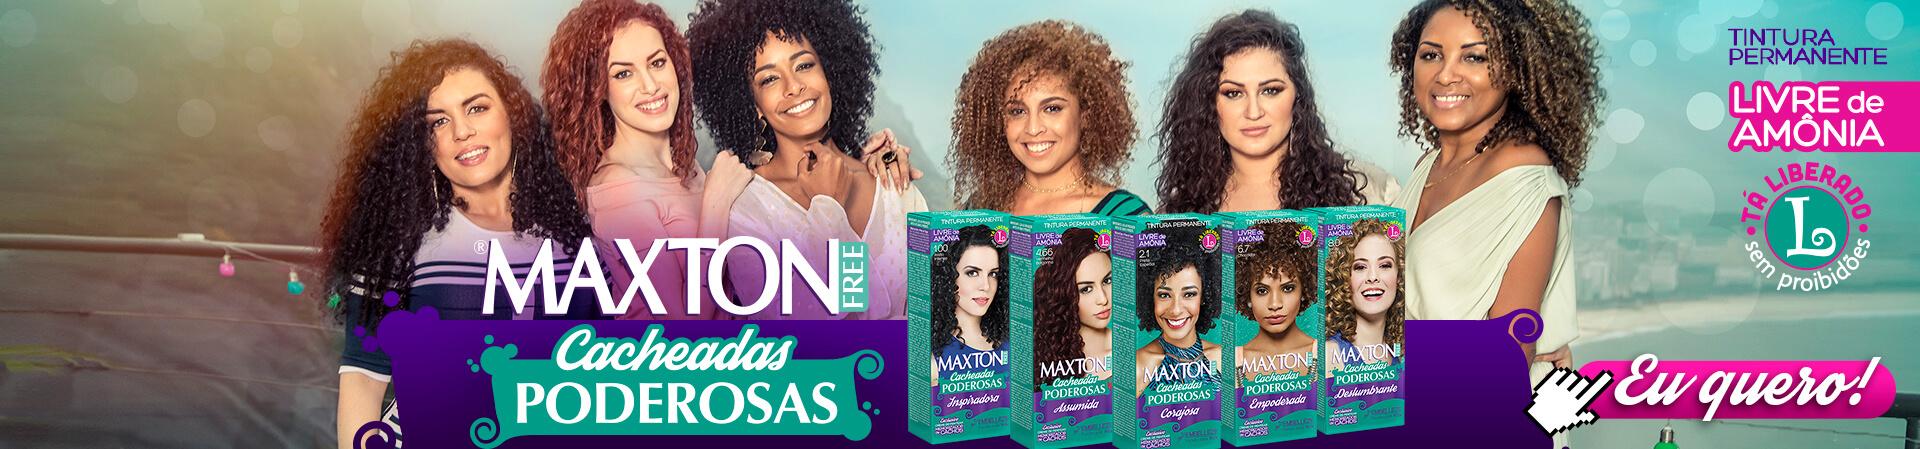 Fullbanner Maxton Free Cacheadas Poderosas